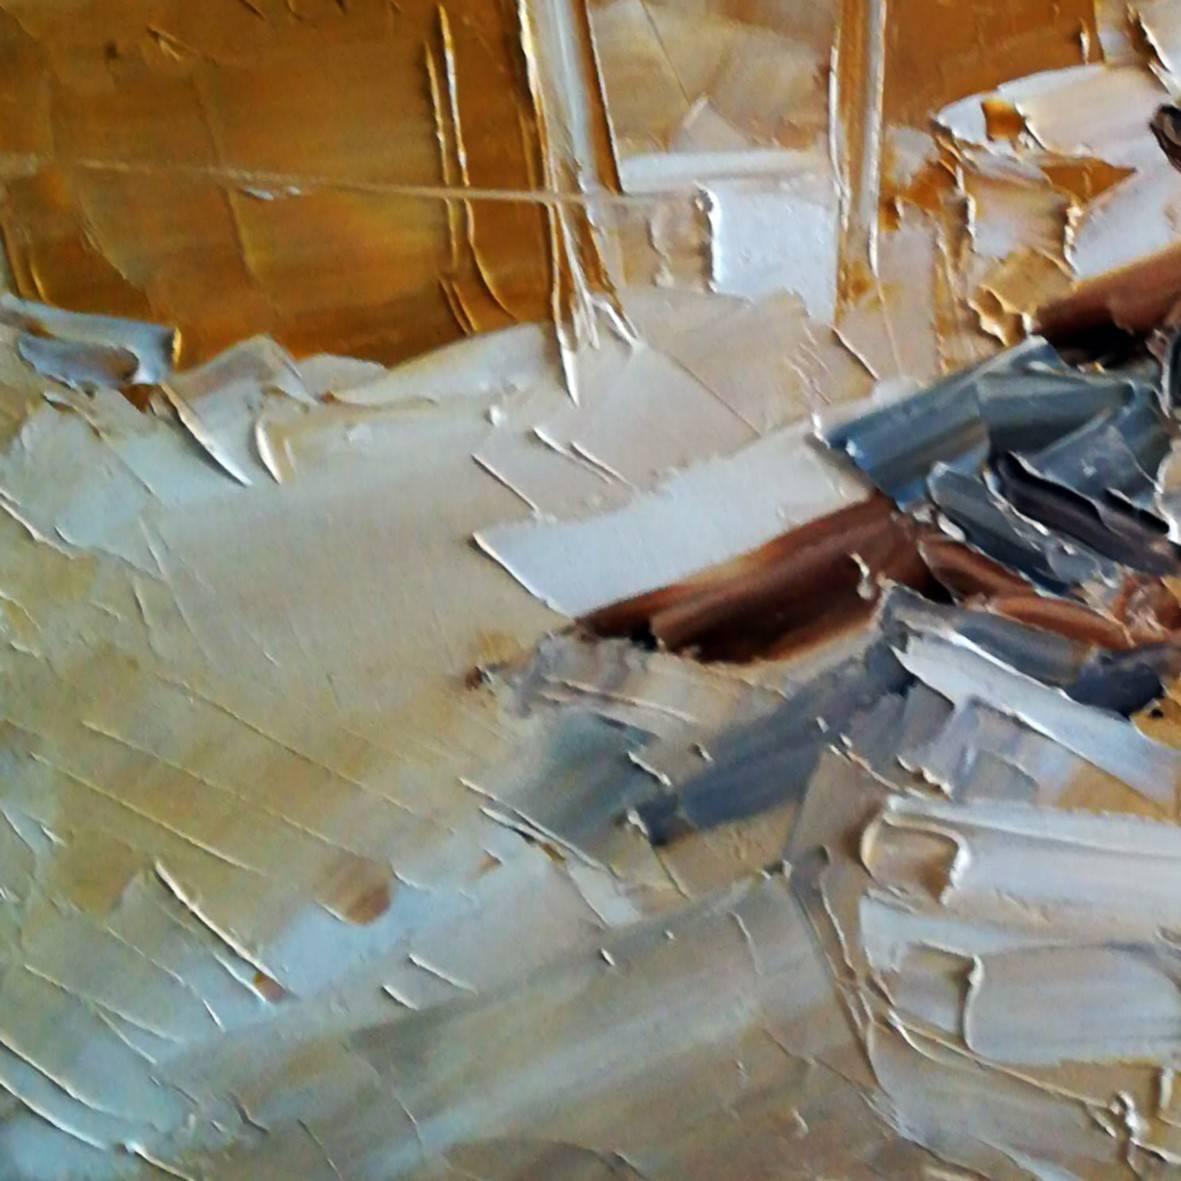 """ Velero "". Cabo de Gata. óleo espátula lienzo. detalle. 31.5 x 31.5 cm. http://bohemiogus.blogspot.com http://www.facebook.com/atomista"